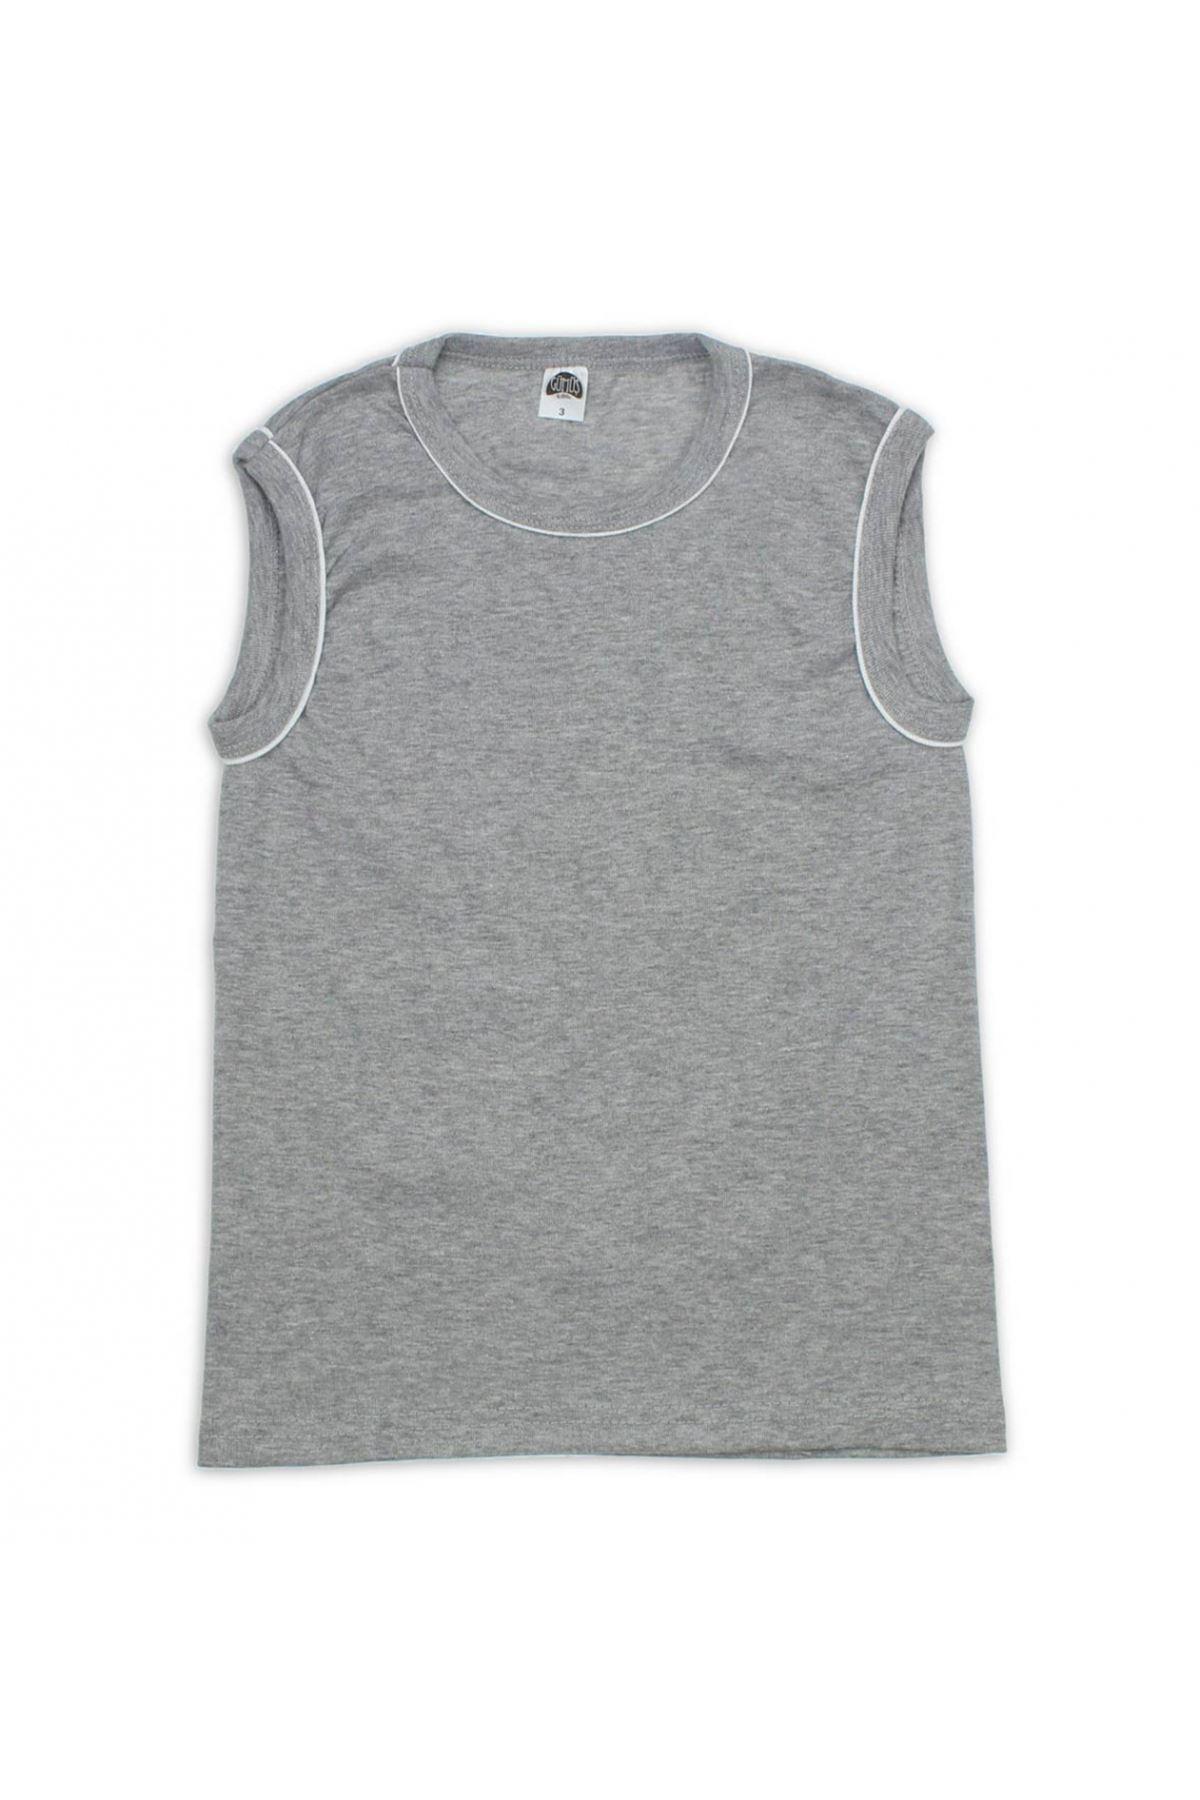 Silver Underwear Clothing Male Child Gray Sports Undershirt 040-4049-011